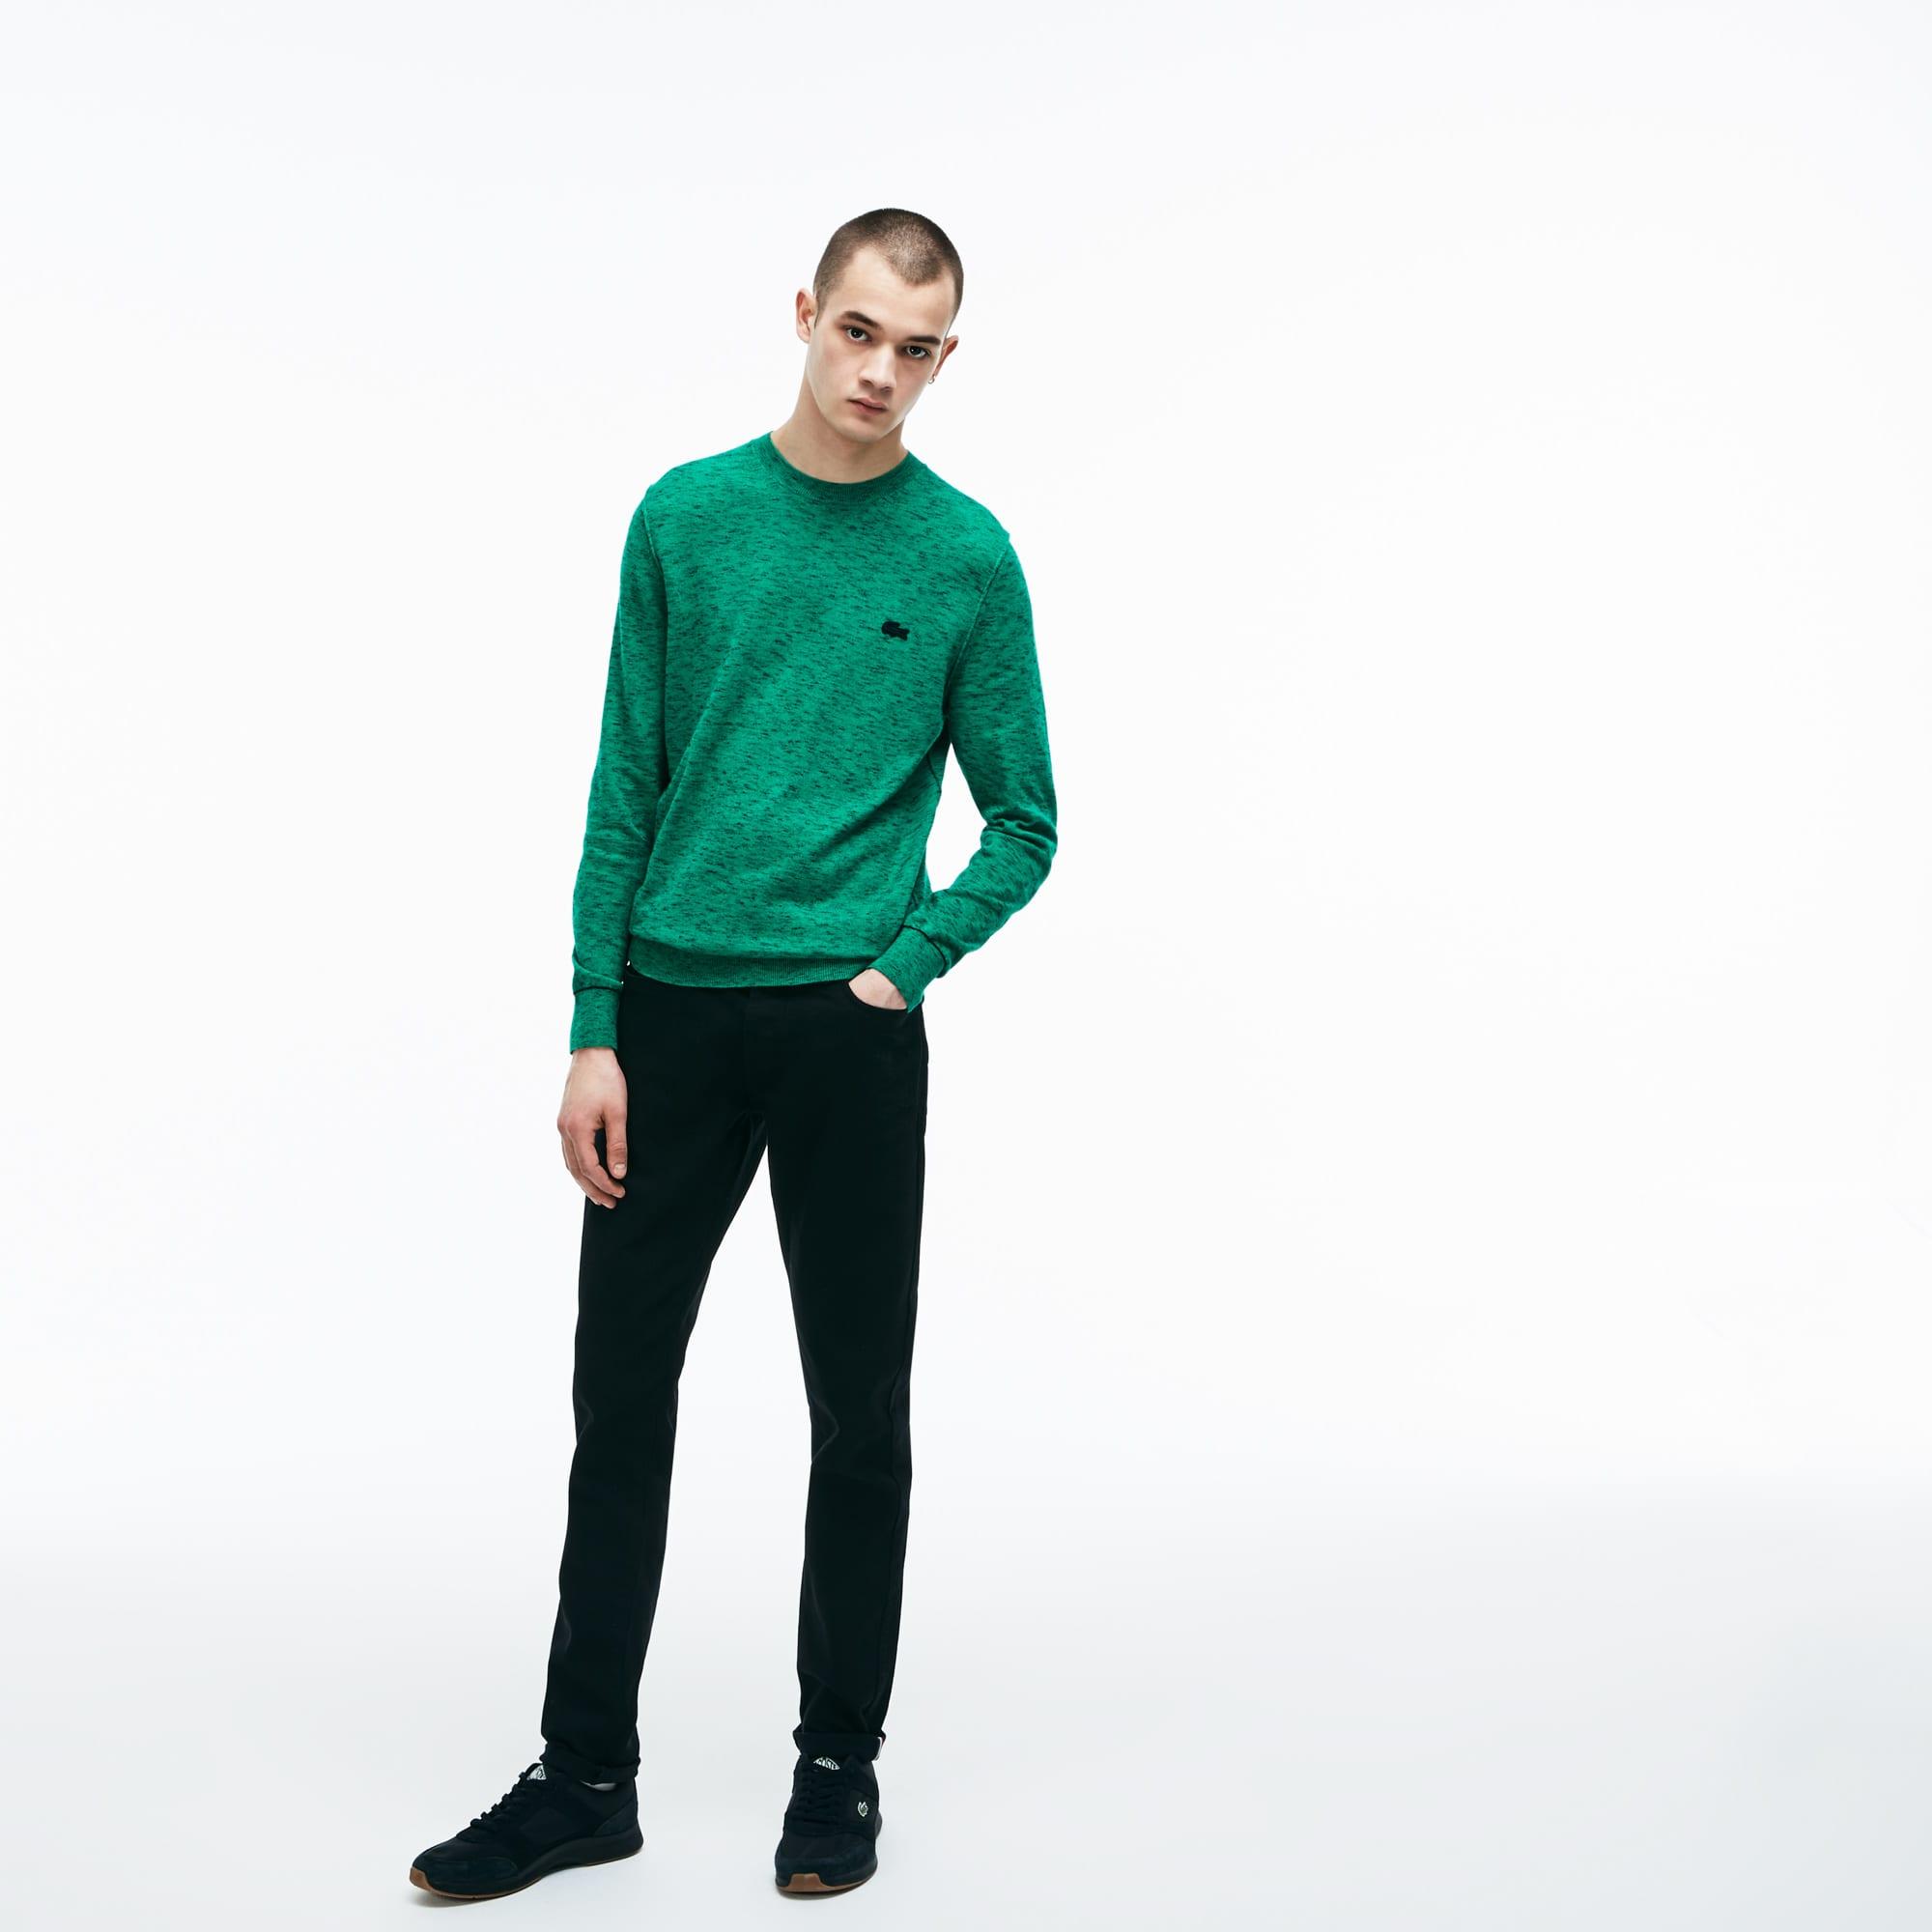 Lacoste LIVE-jeans Heren Stretch-Katoen met 5 Zakken en Omgevouwen Rand